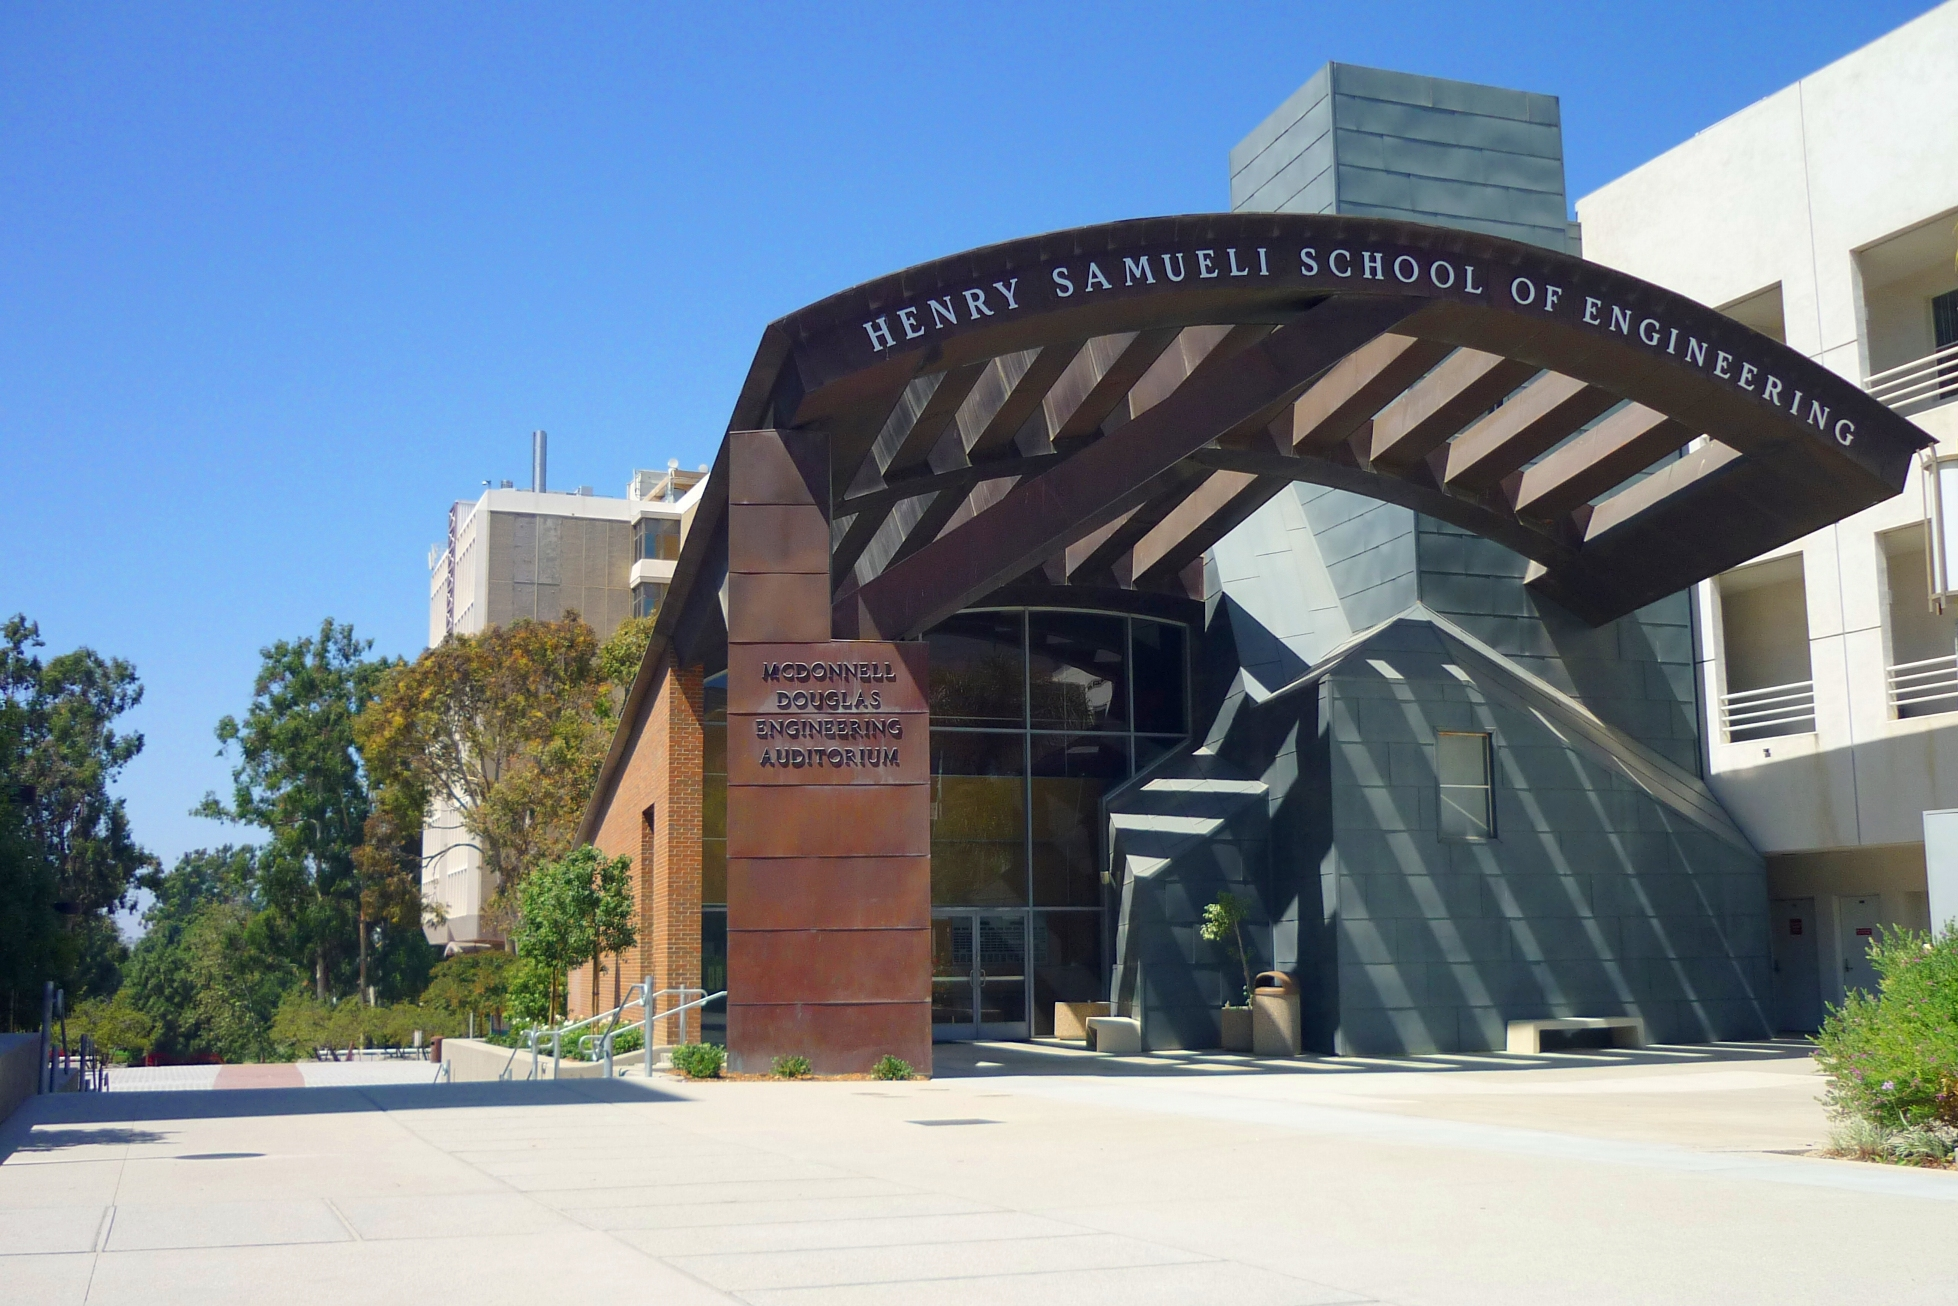 UC Irvine, School of Engineering